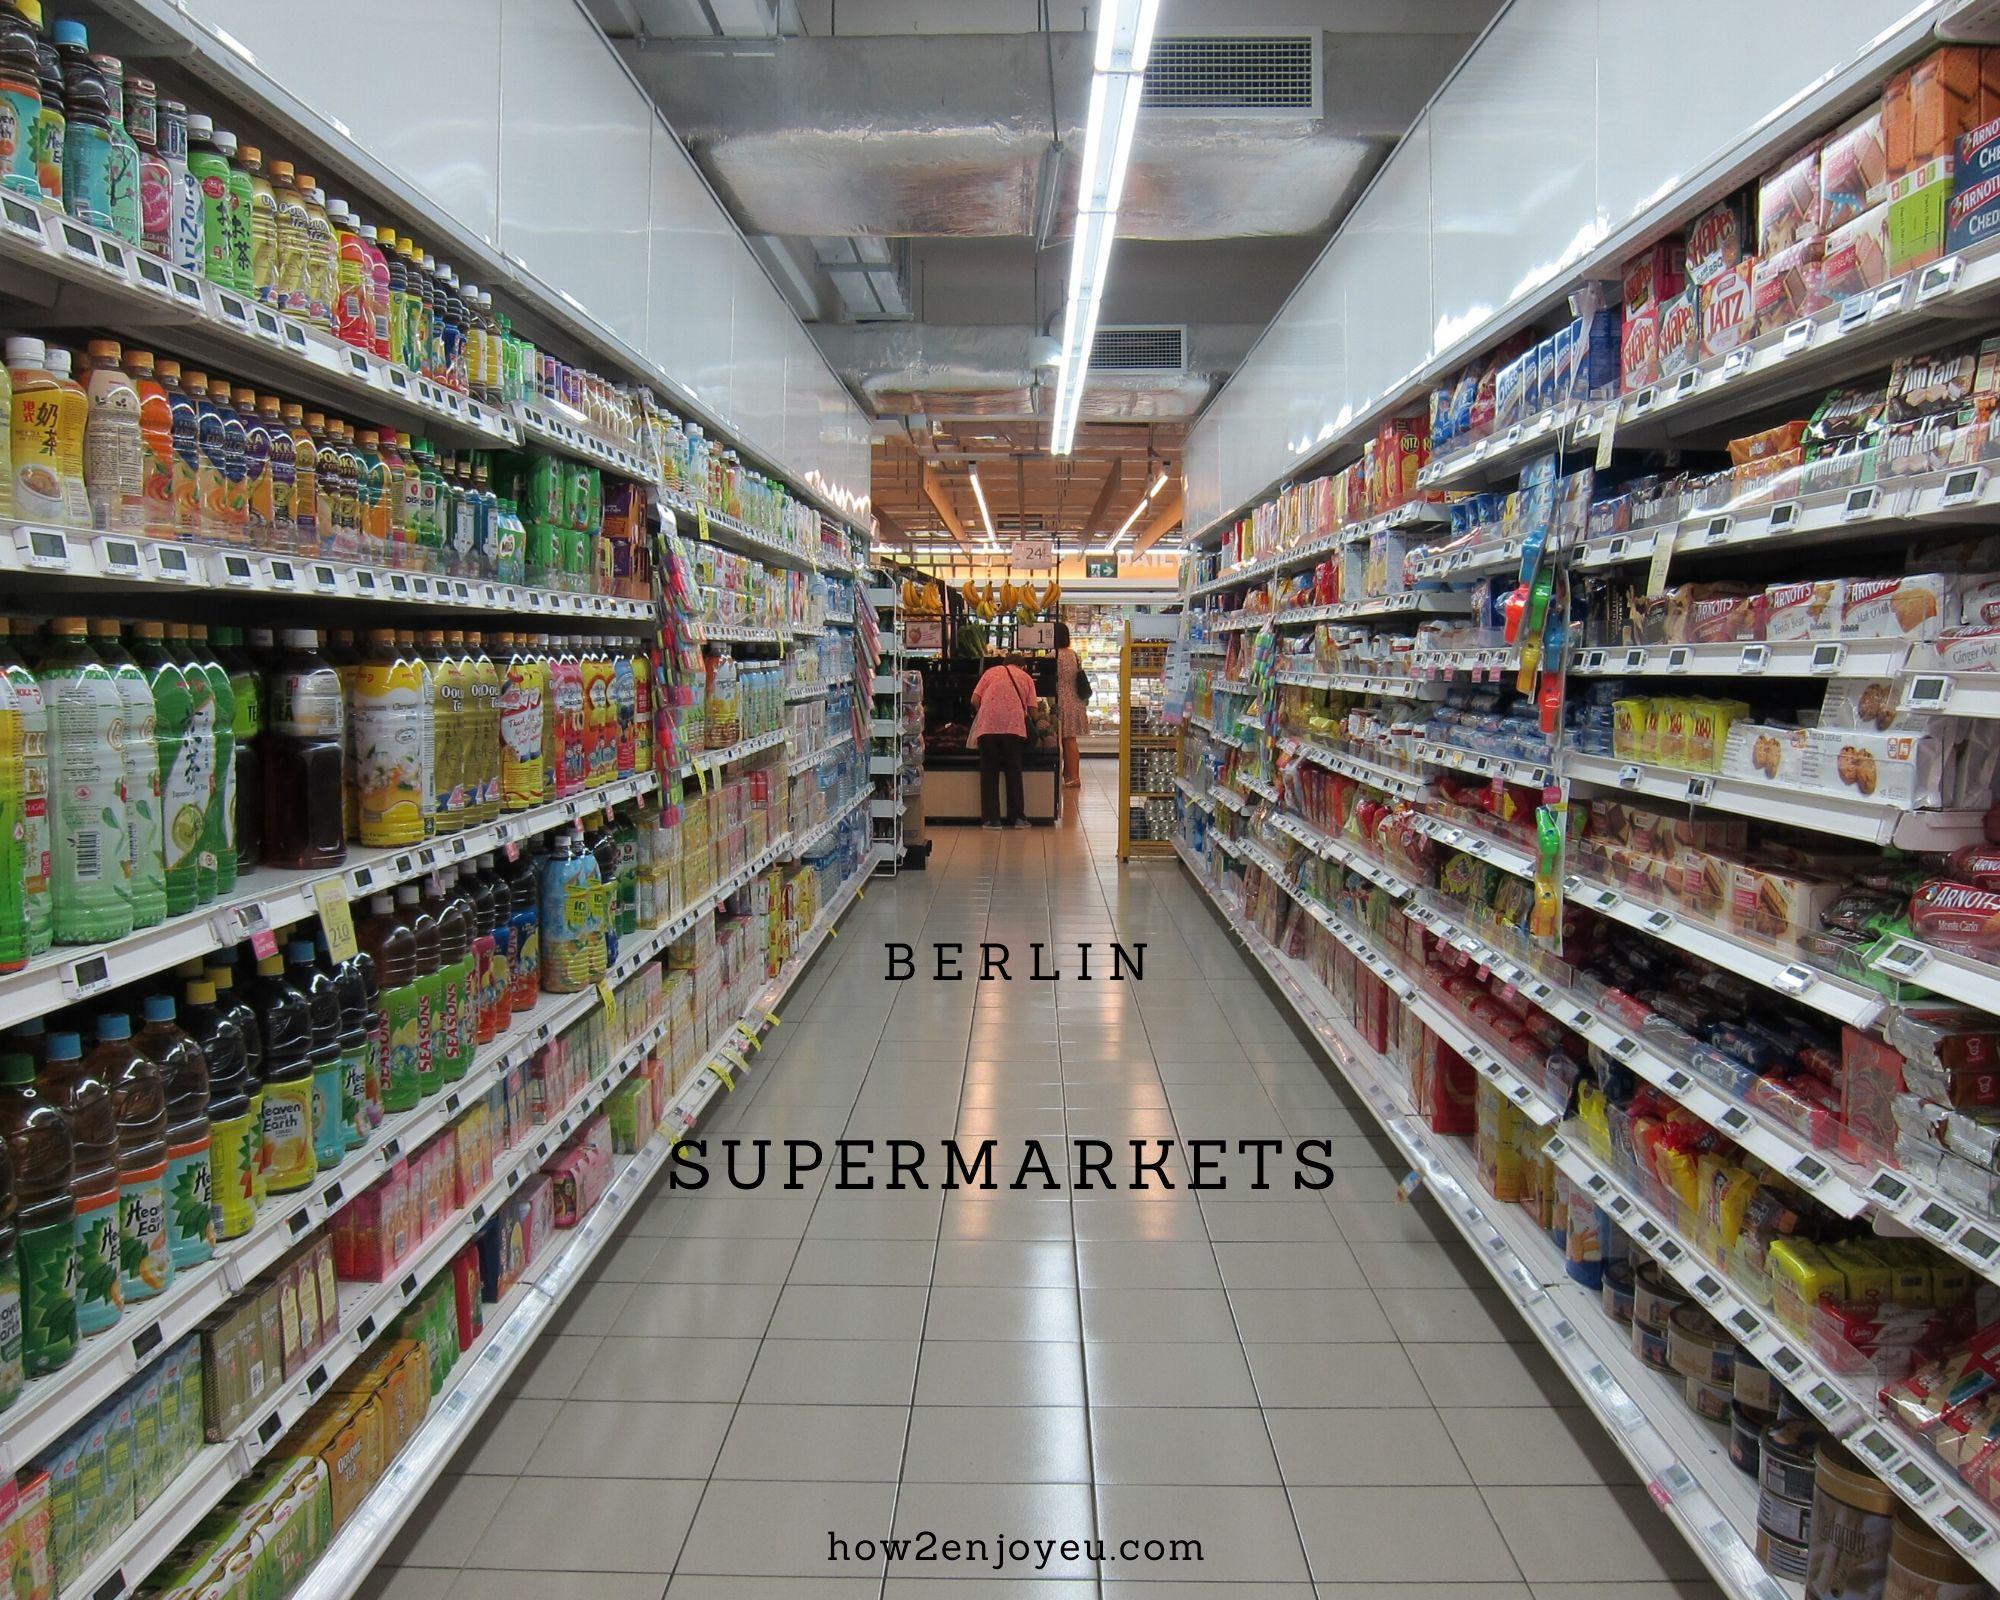 Read more about the article コロナ厳戒態勢になって初めての週末、ベルリンのスーパーもギスギスしてきた